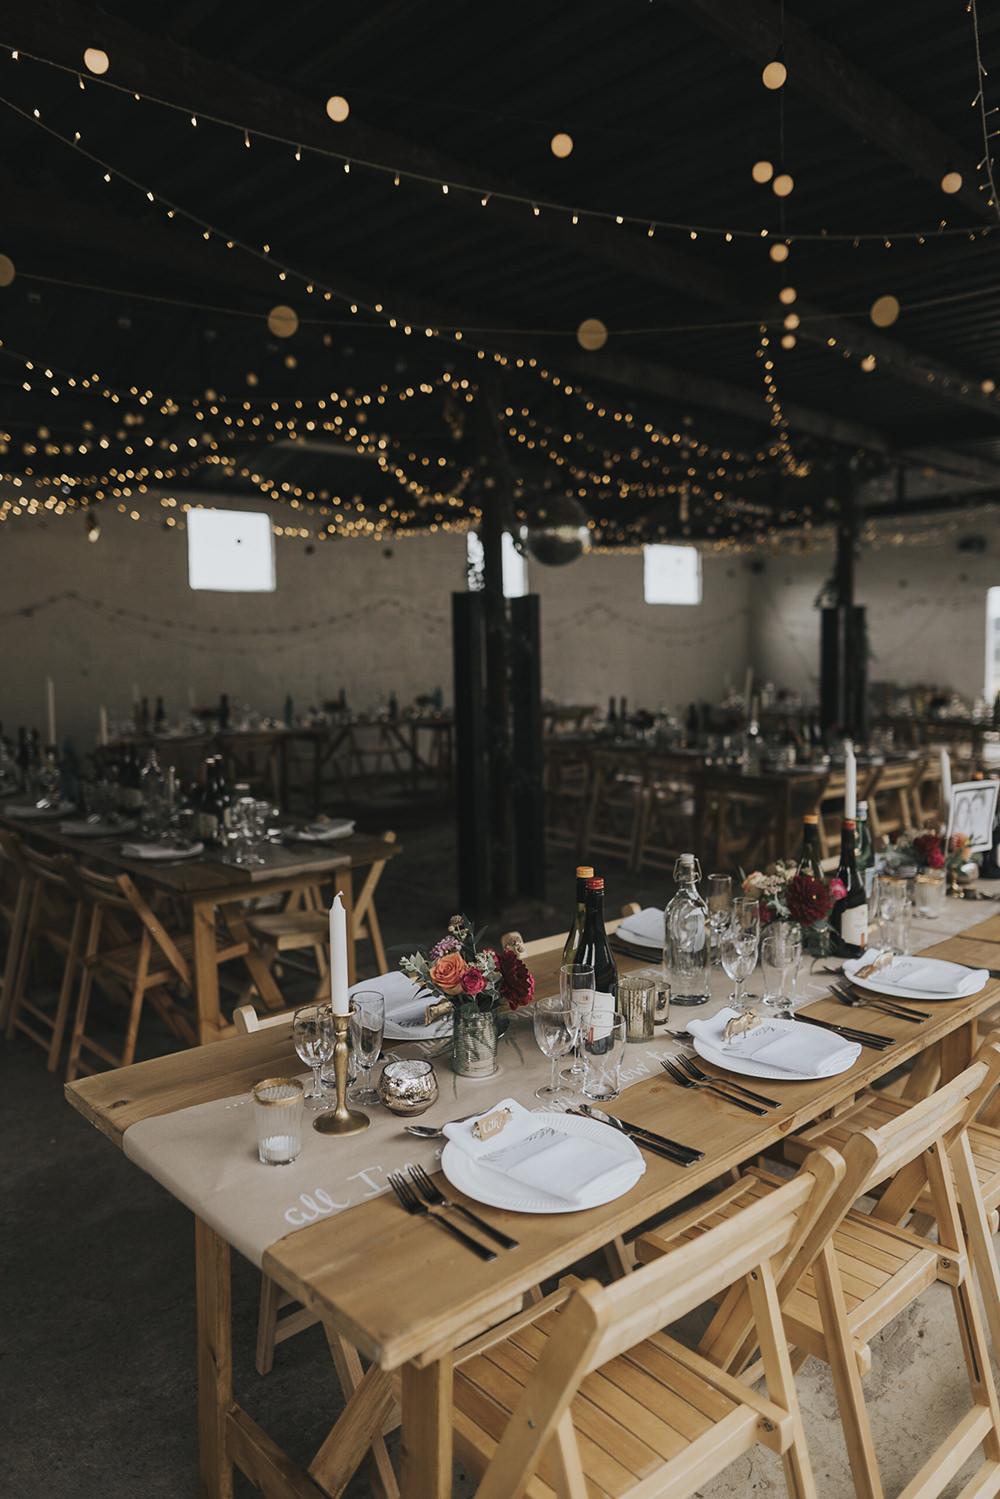 Table Runner Festoon Lighting Brass Candlesticks Celestial Cow Shed Wedding Tora Baker Photography